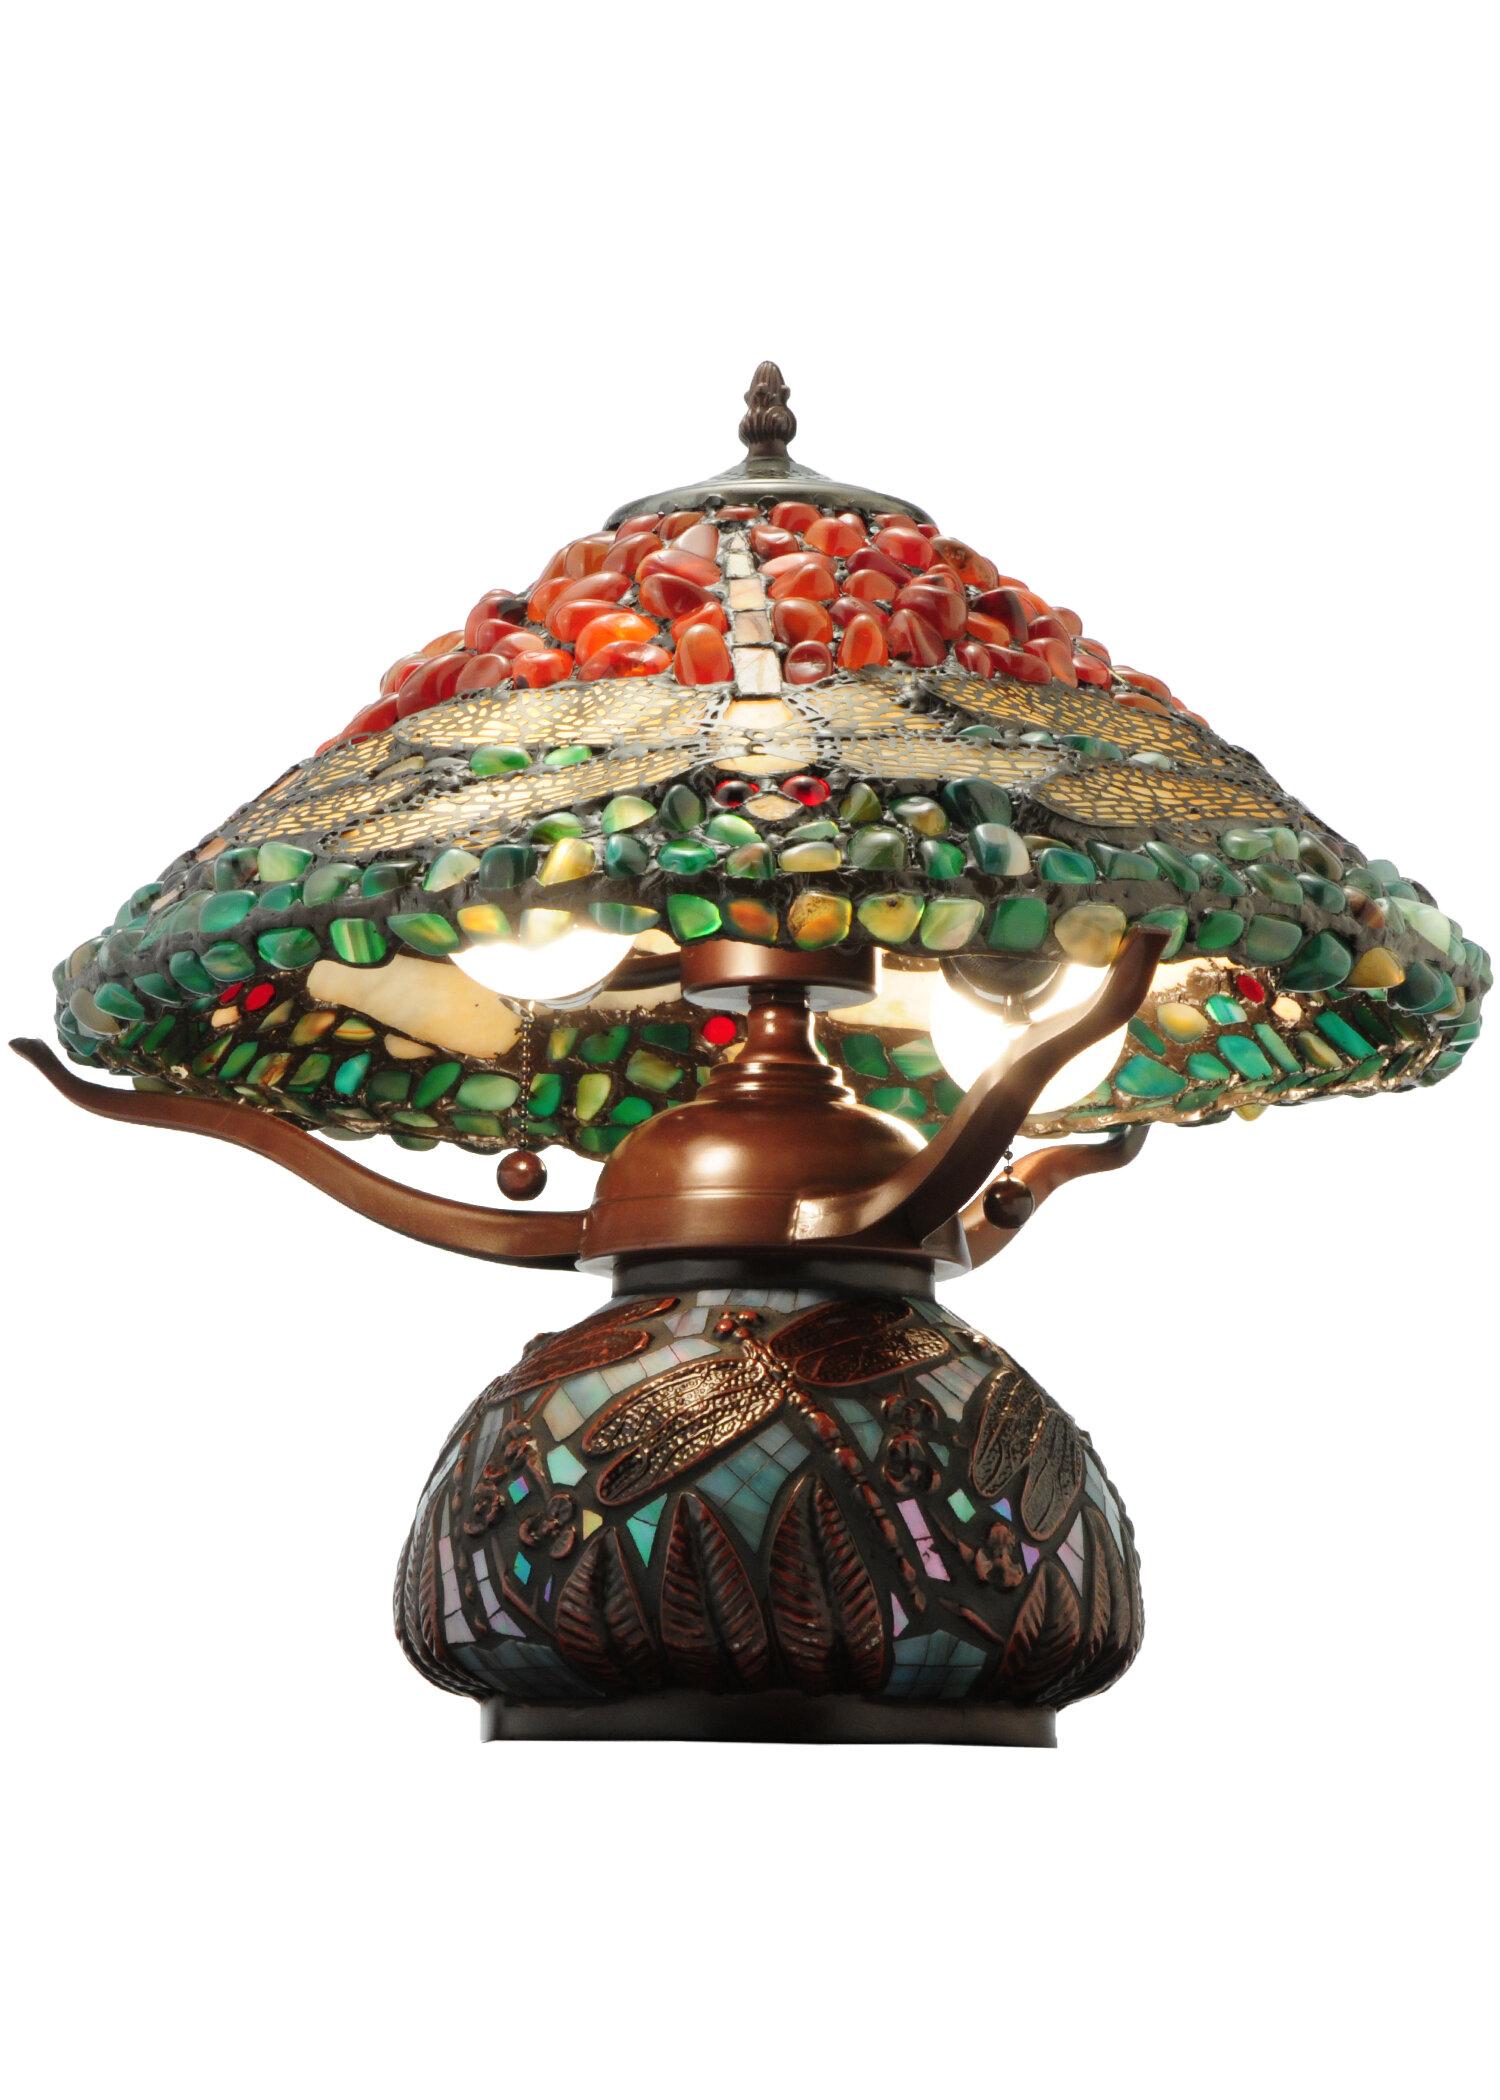 Meyda Tiffany Dragonfly Polished Agata 16 5 Table Lamp Wayfair